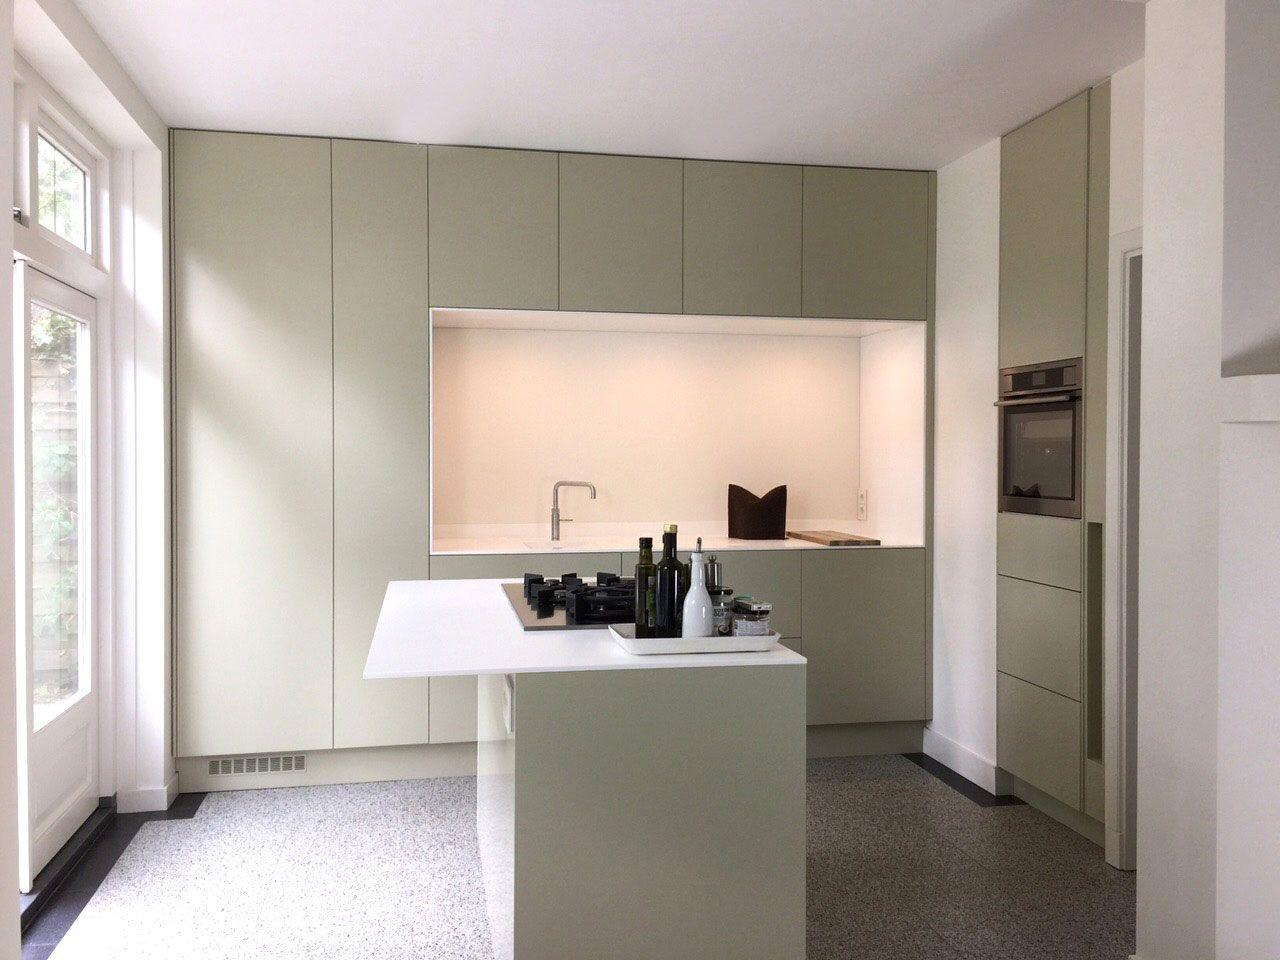 Luxe keuken mijn keukens op maat laten maken woning vdb pinterest kitchen small and kitchens - Moderne kleur huis ...